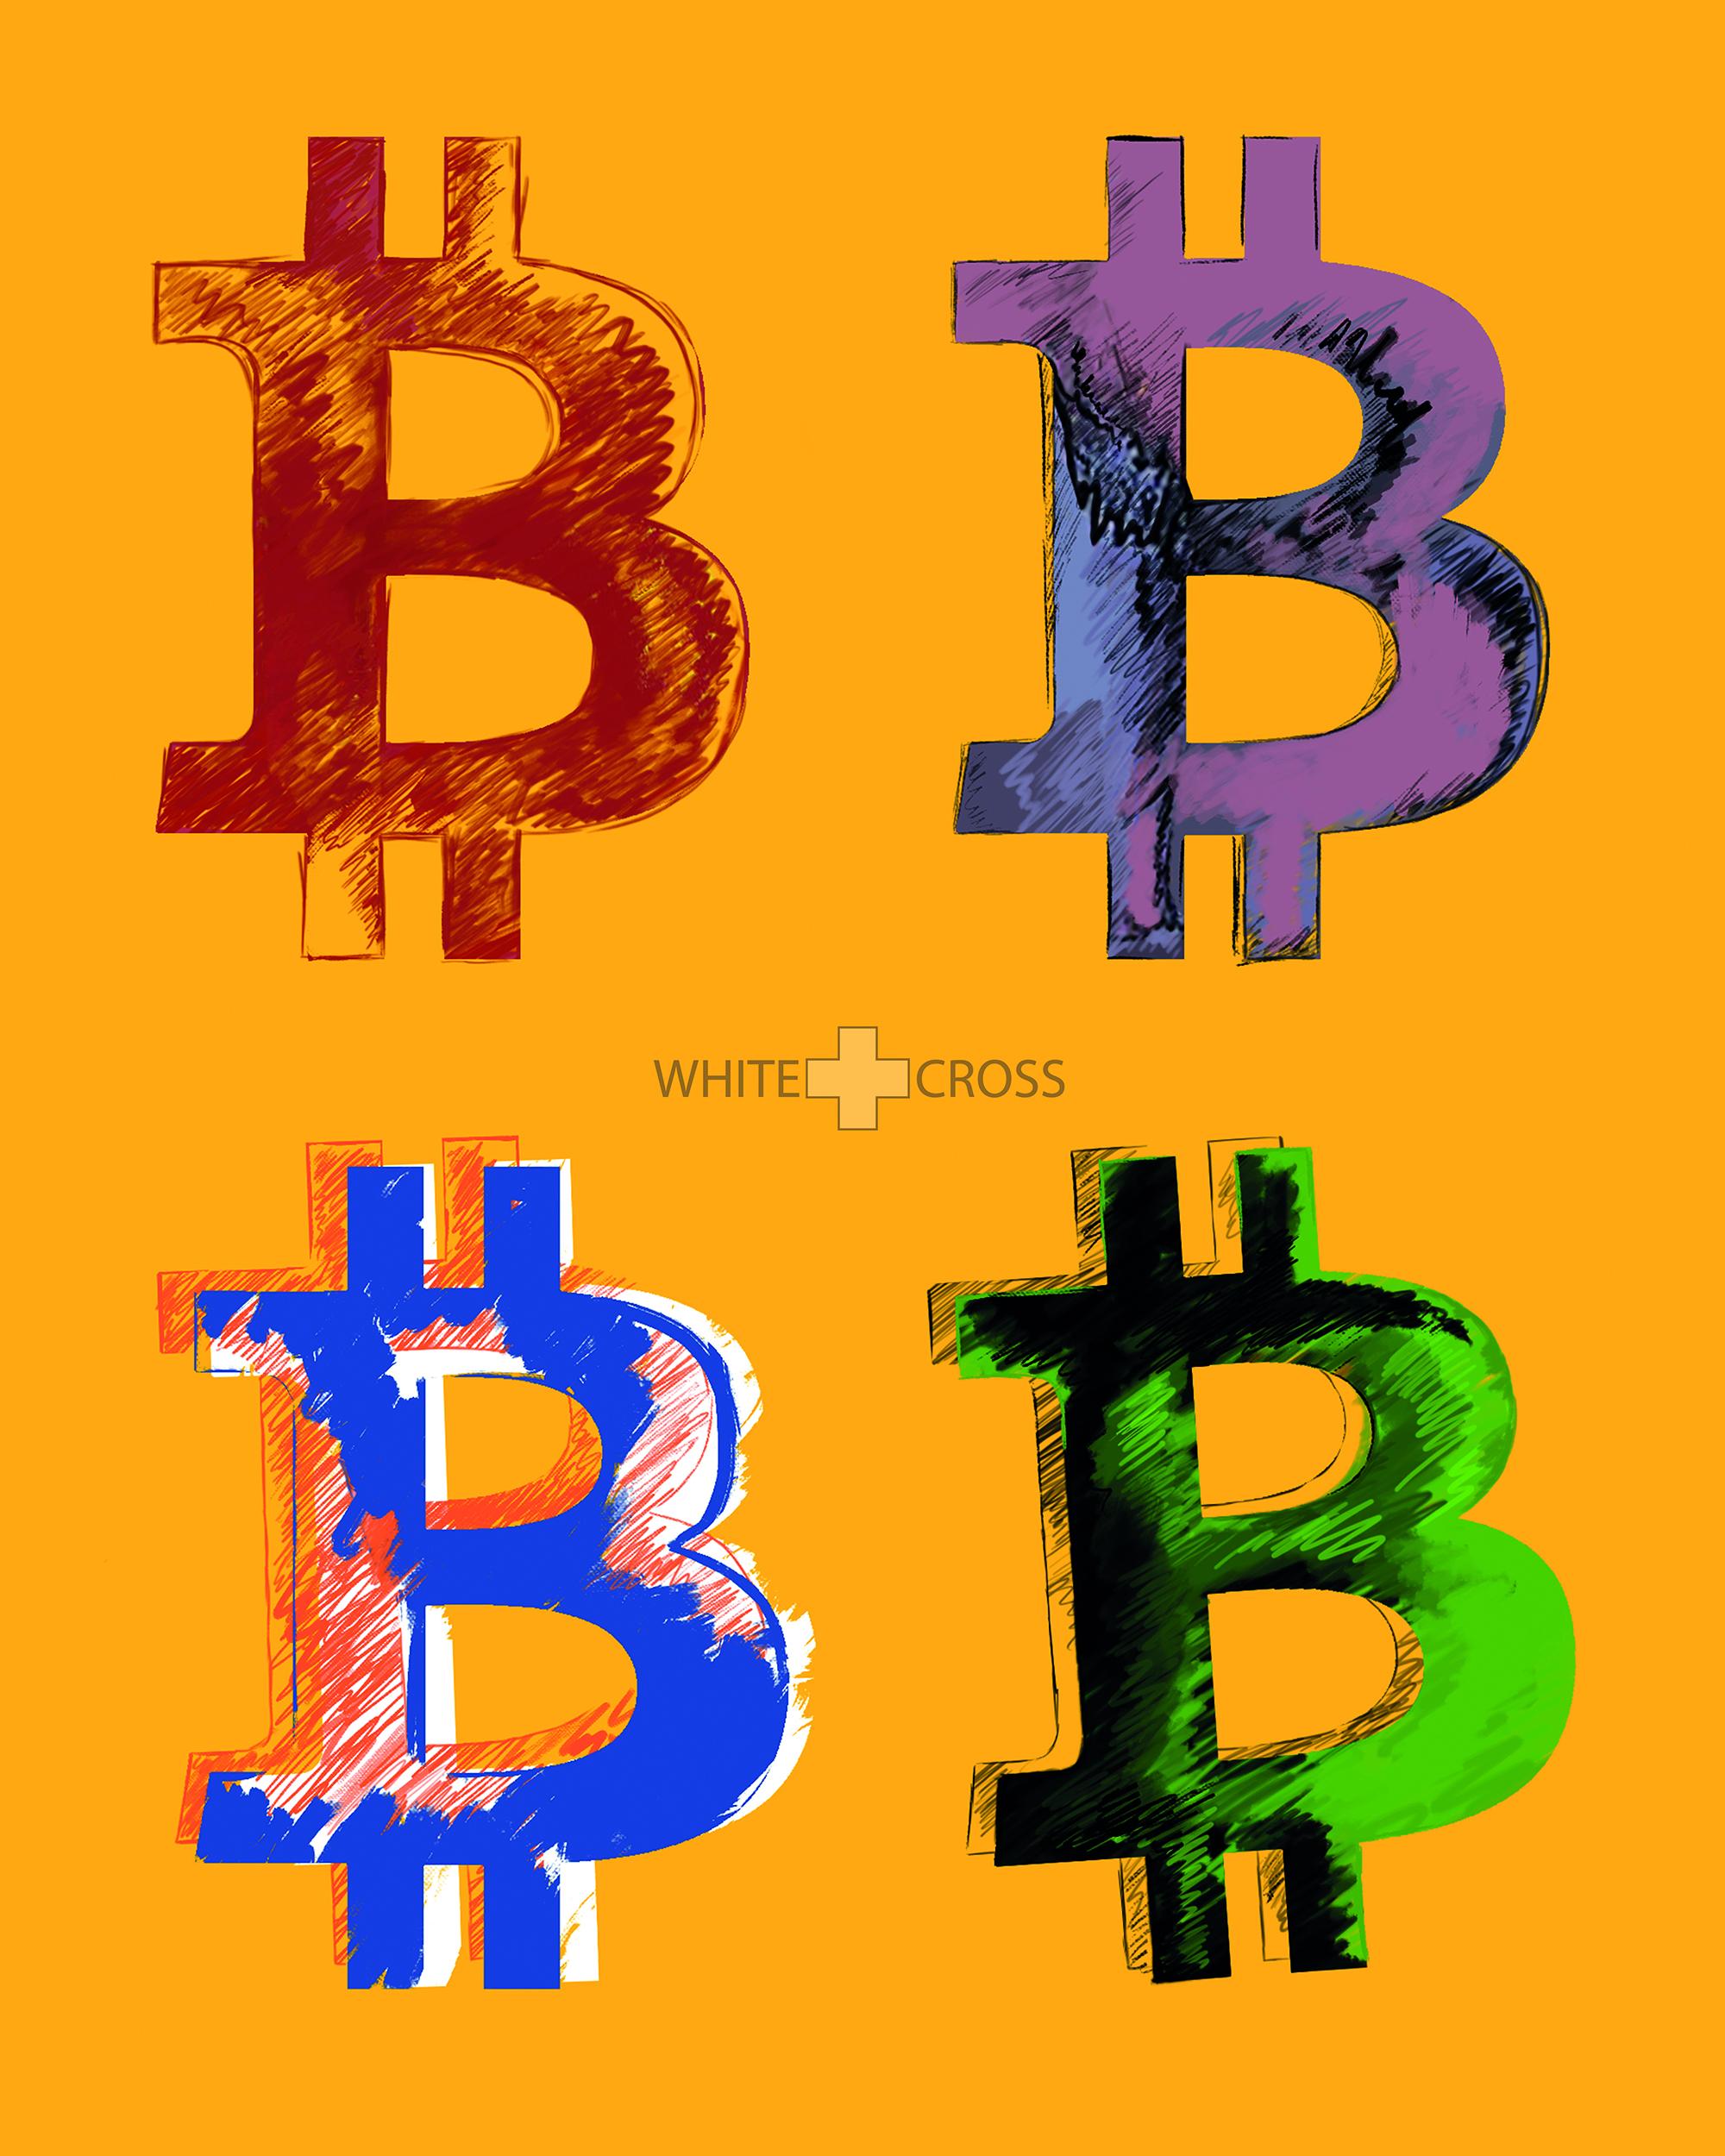 Bitcoin 16x20_WM_WMCW.jpg